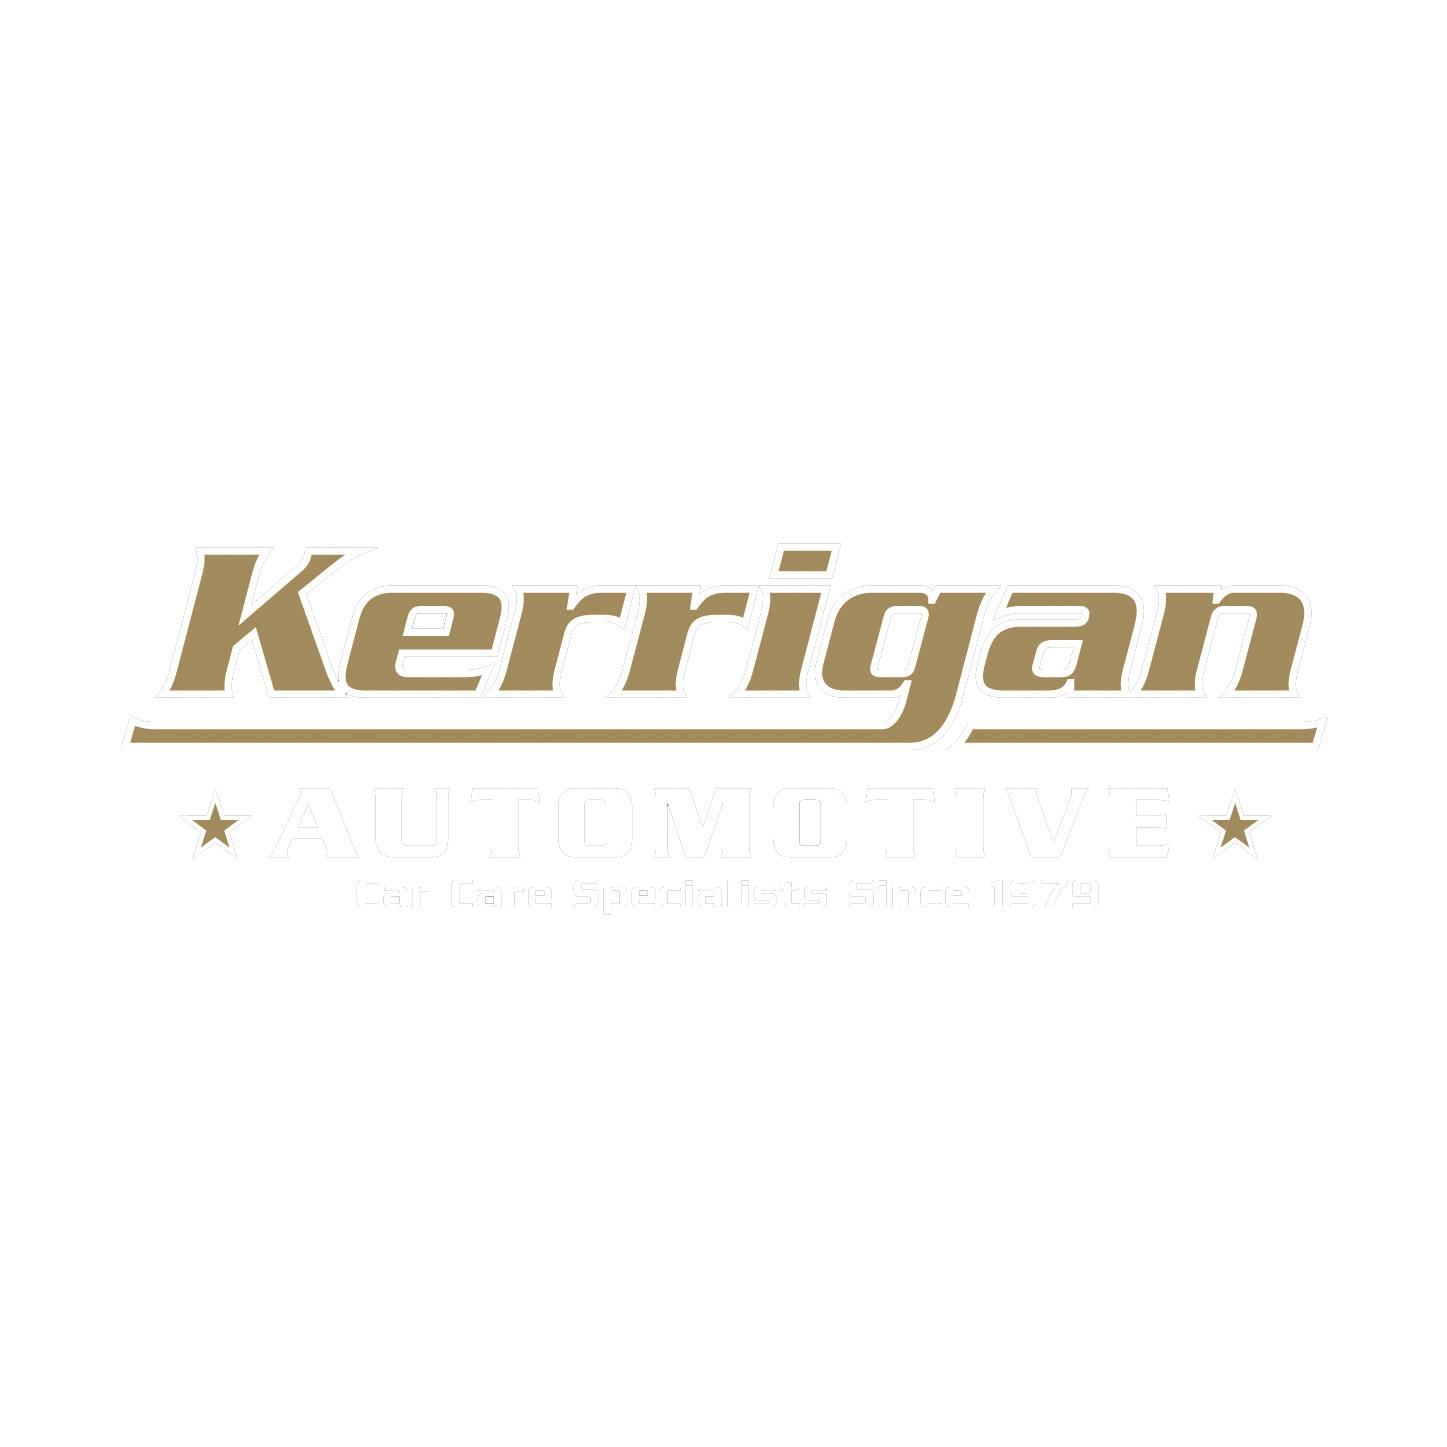 Kerrigan Automotive - Doylestown, PA - General Auto Repair & Service